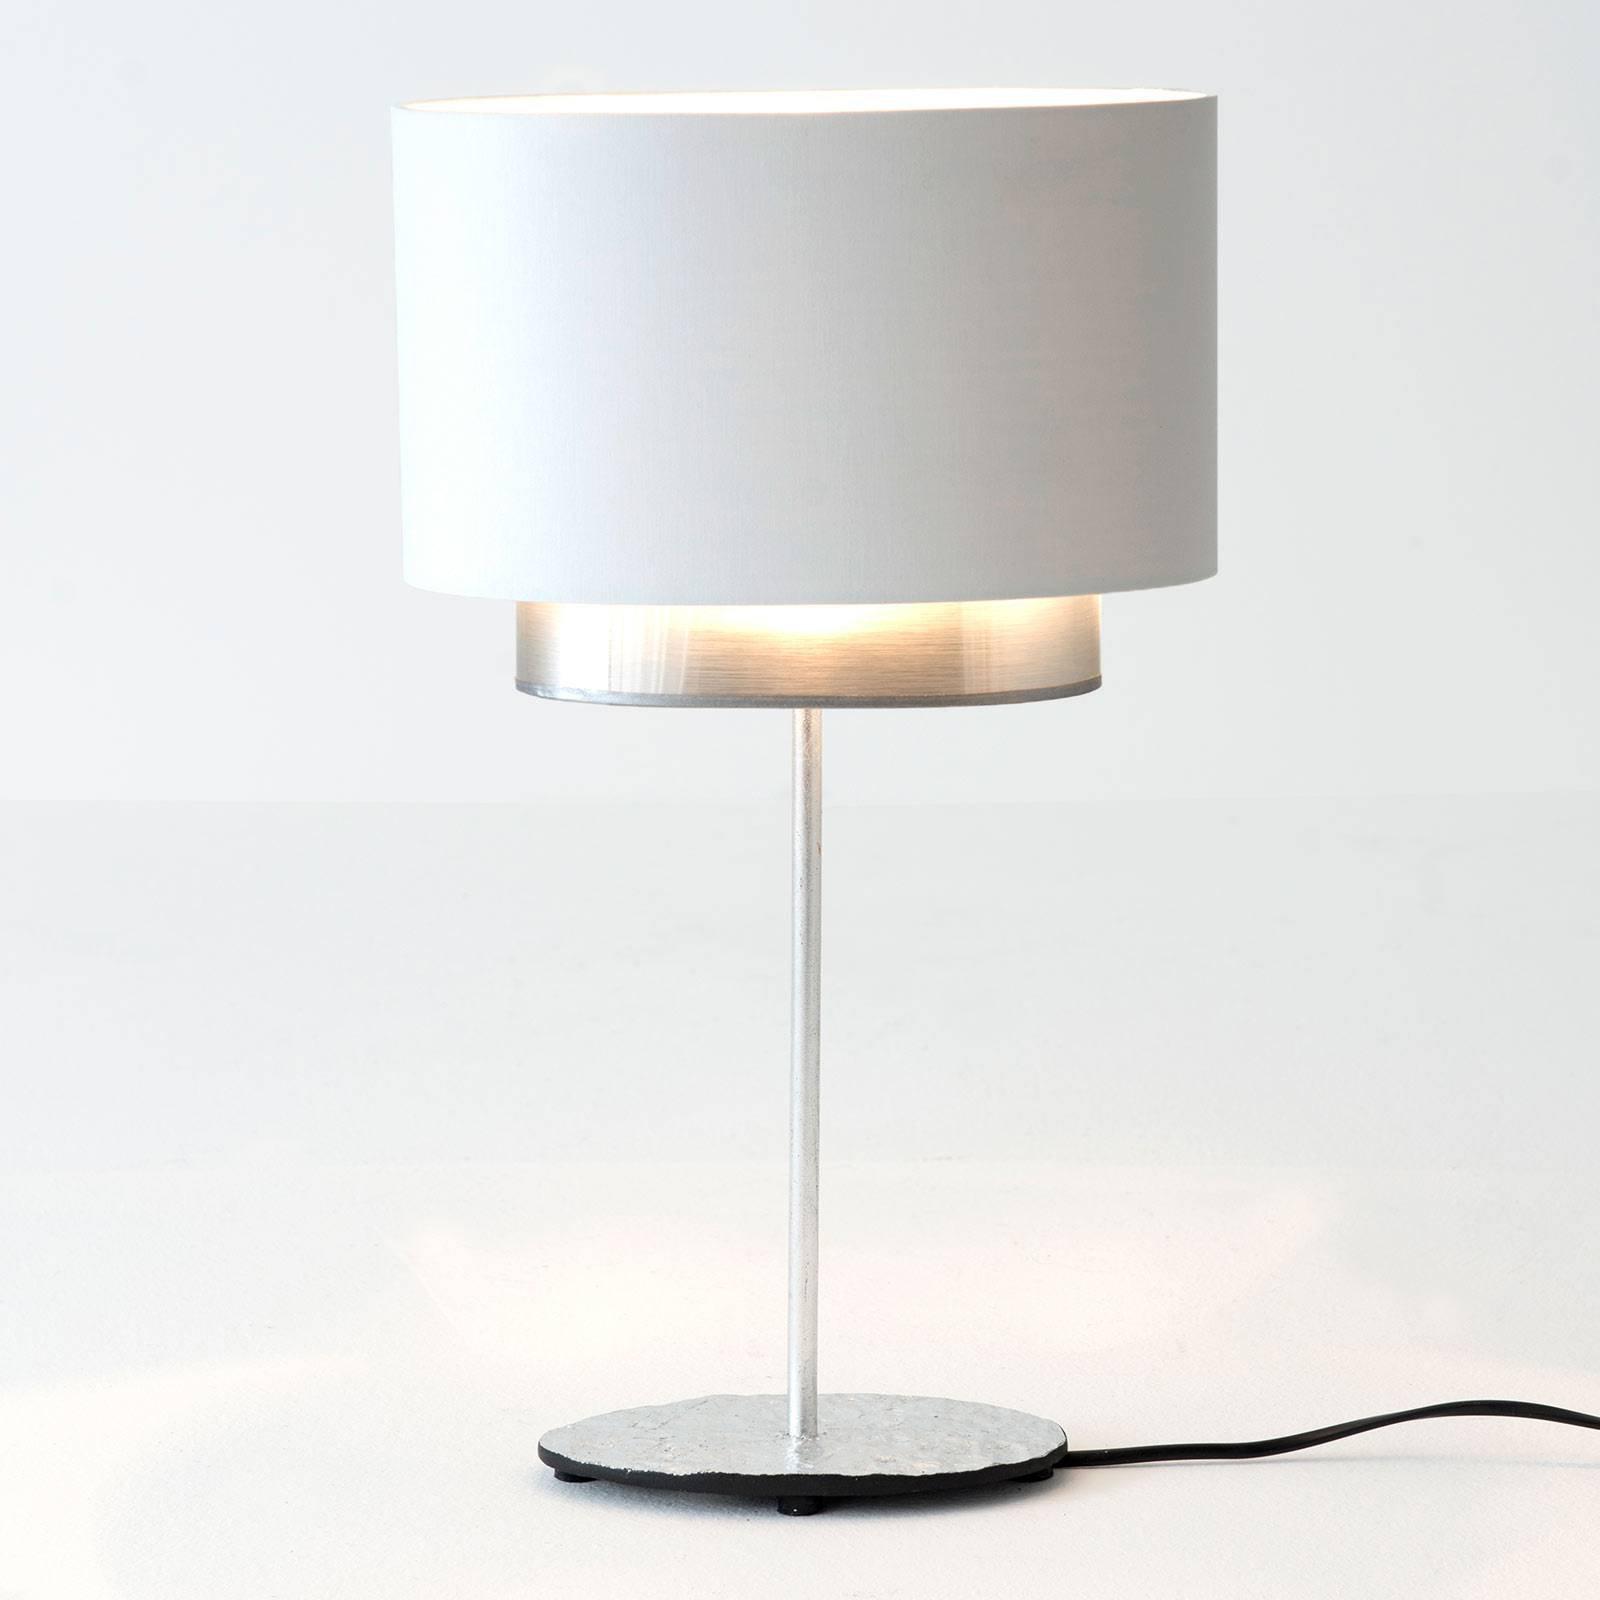 Bordlampe Mattia, oval, dobbel, hvit/sølv